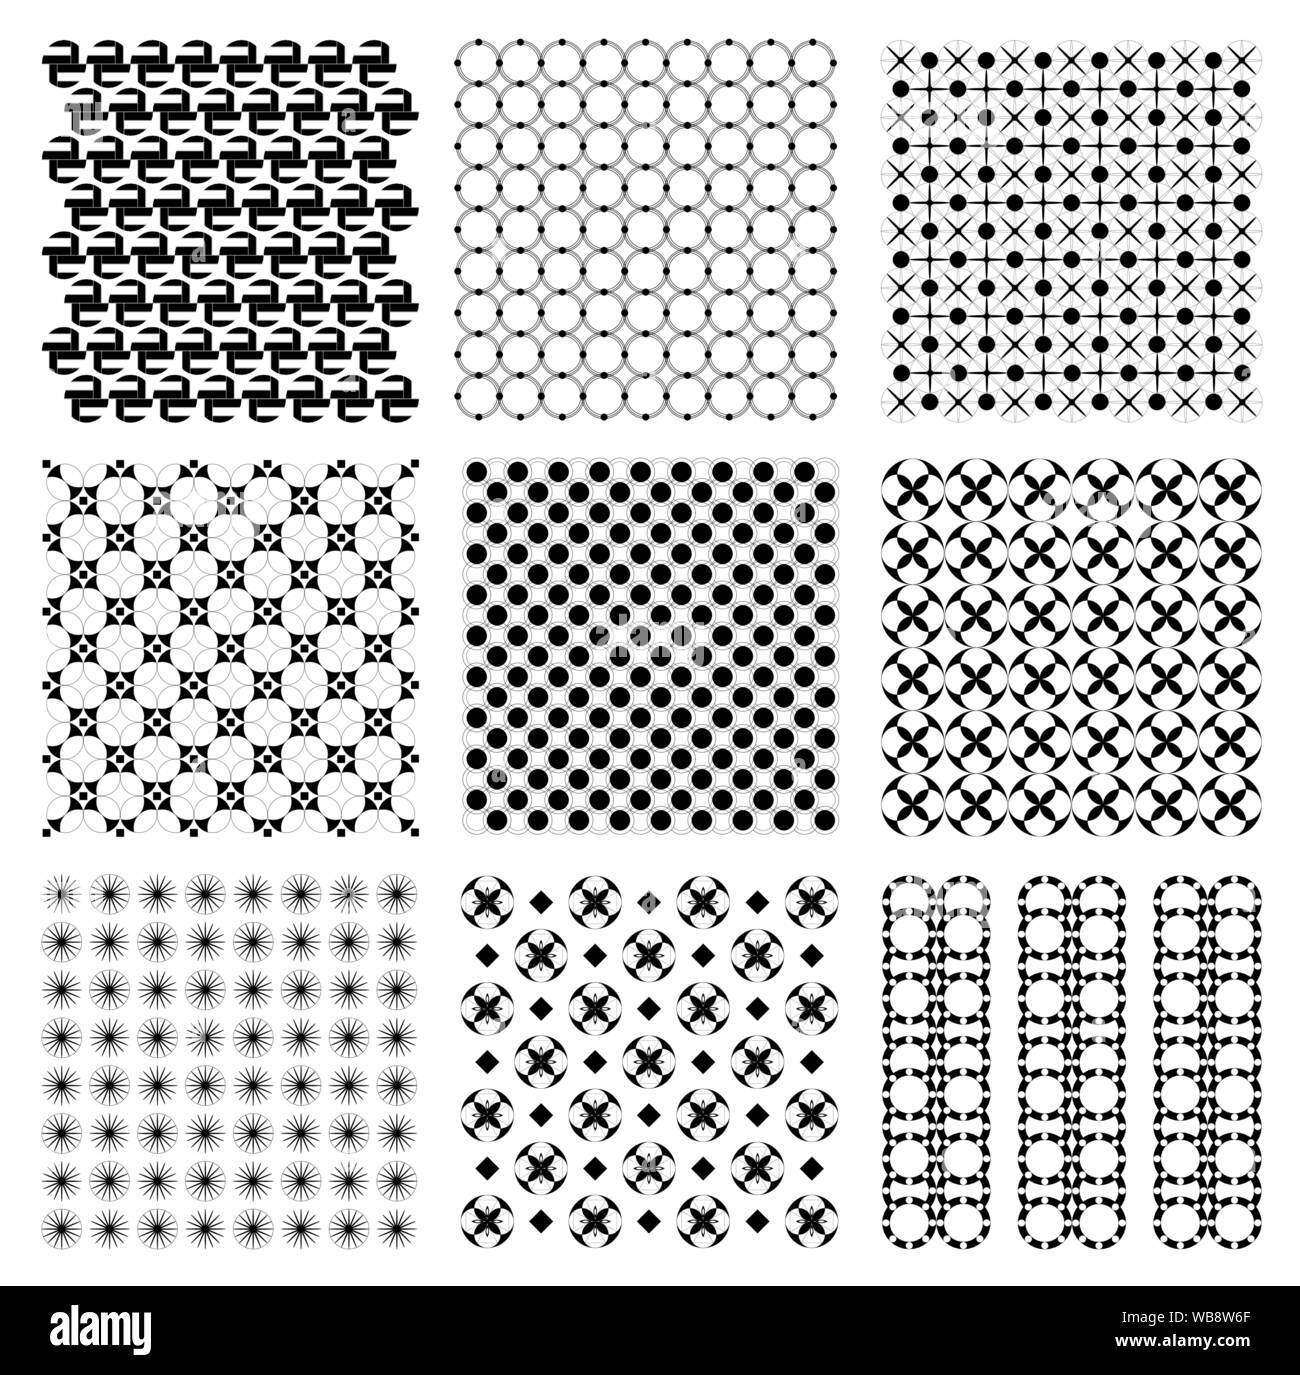 Seamless Vintage Japanese Retro Hexagon Pattern Illustration